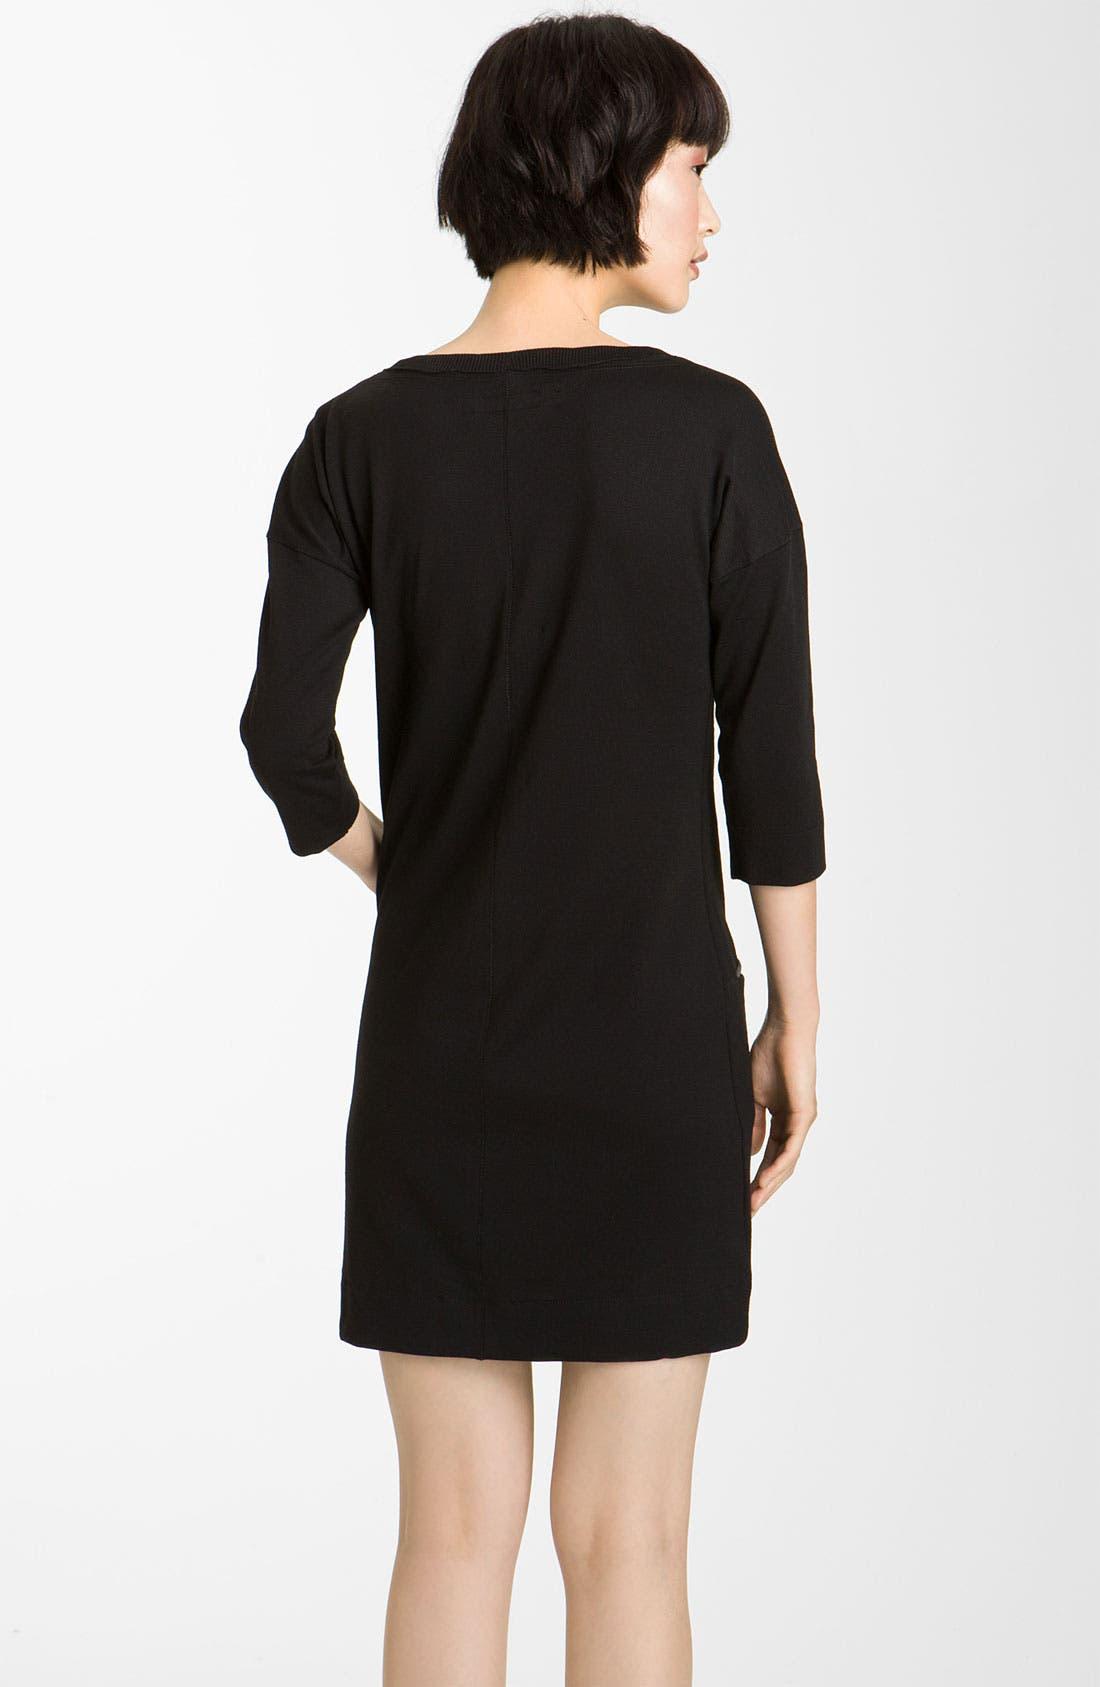 Alternate Image 2  - rag & bone/KNIT 'Cornish' Dress